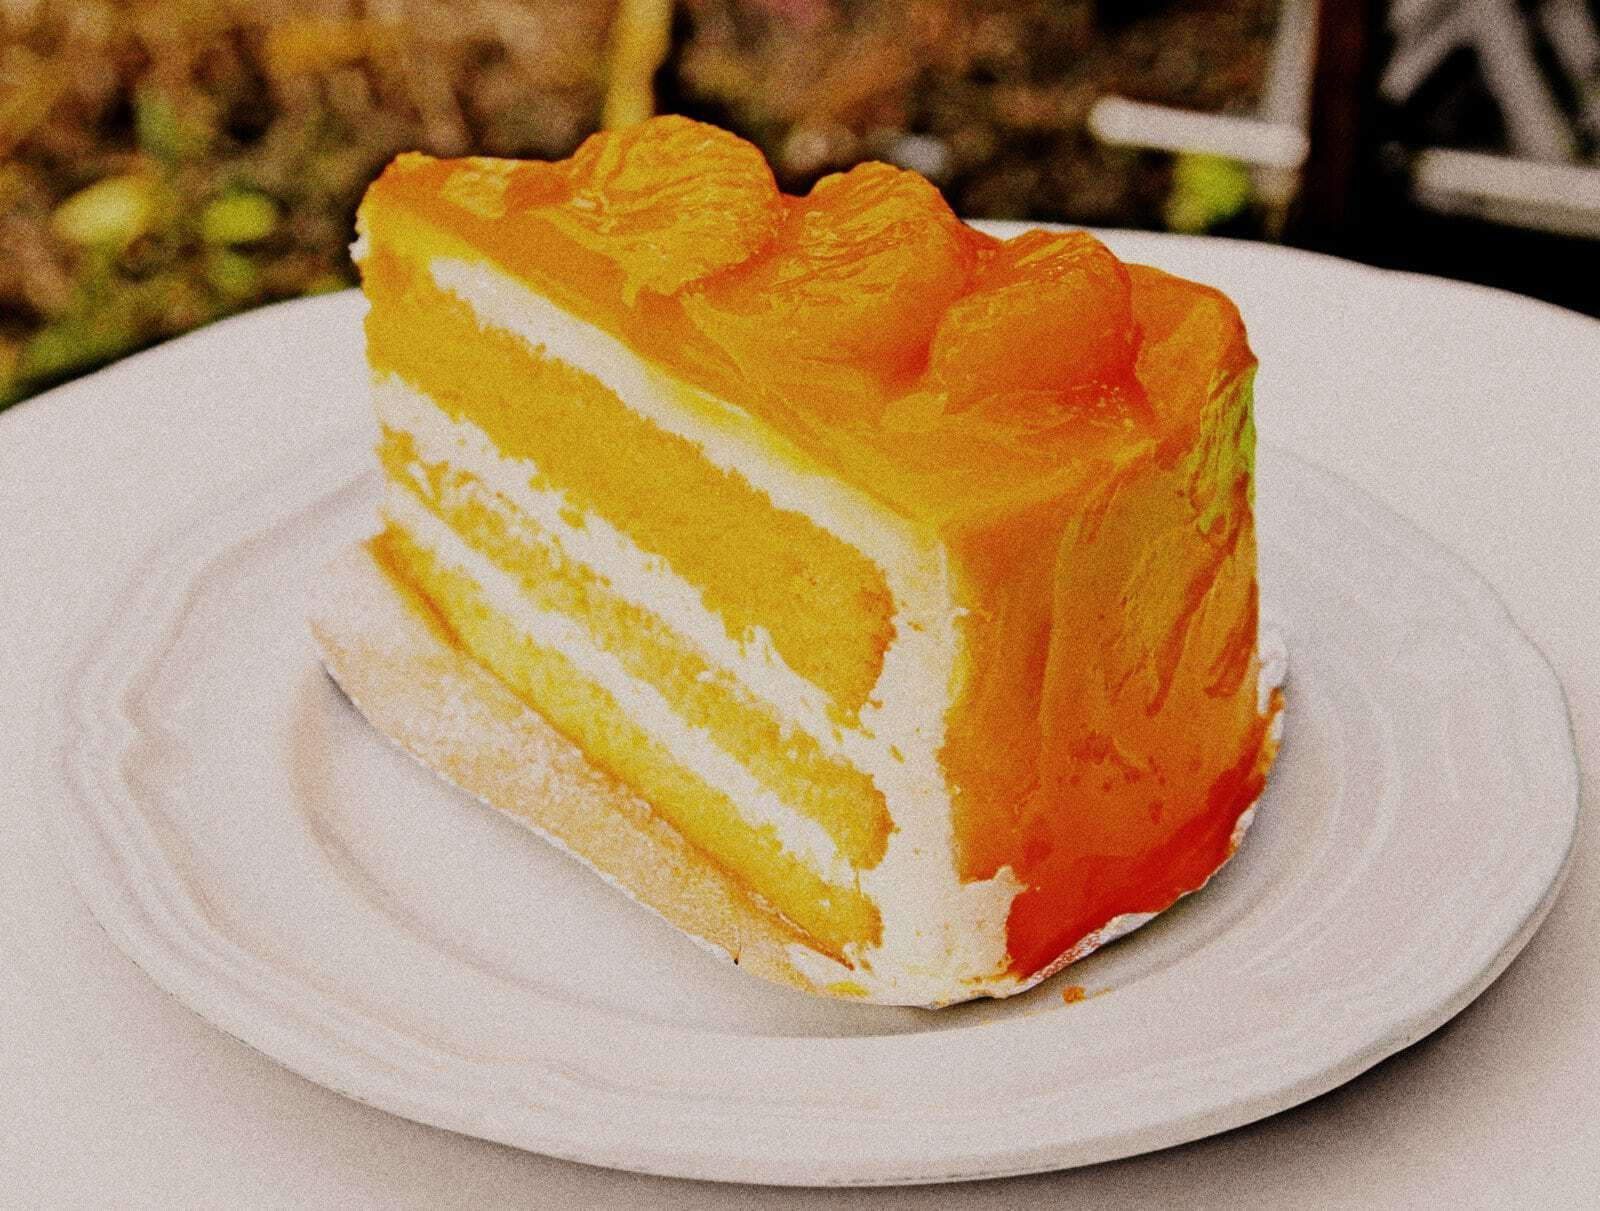 Orange Cake Icing Recipes: Classic Orange Cake, Filling & Frosting Recipes (1912